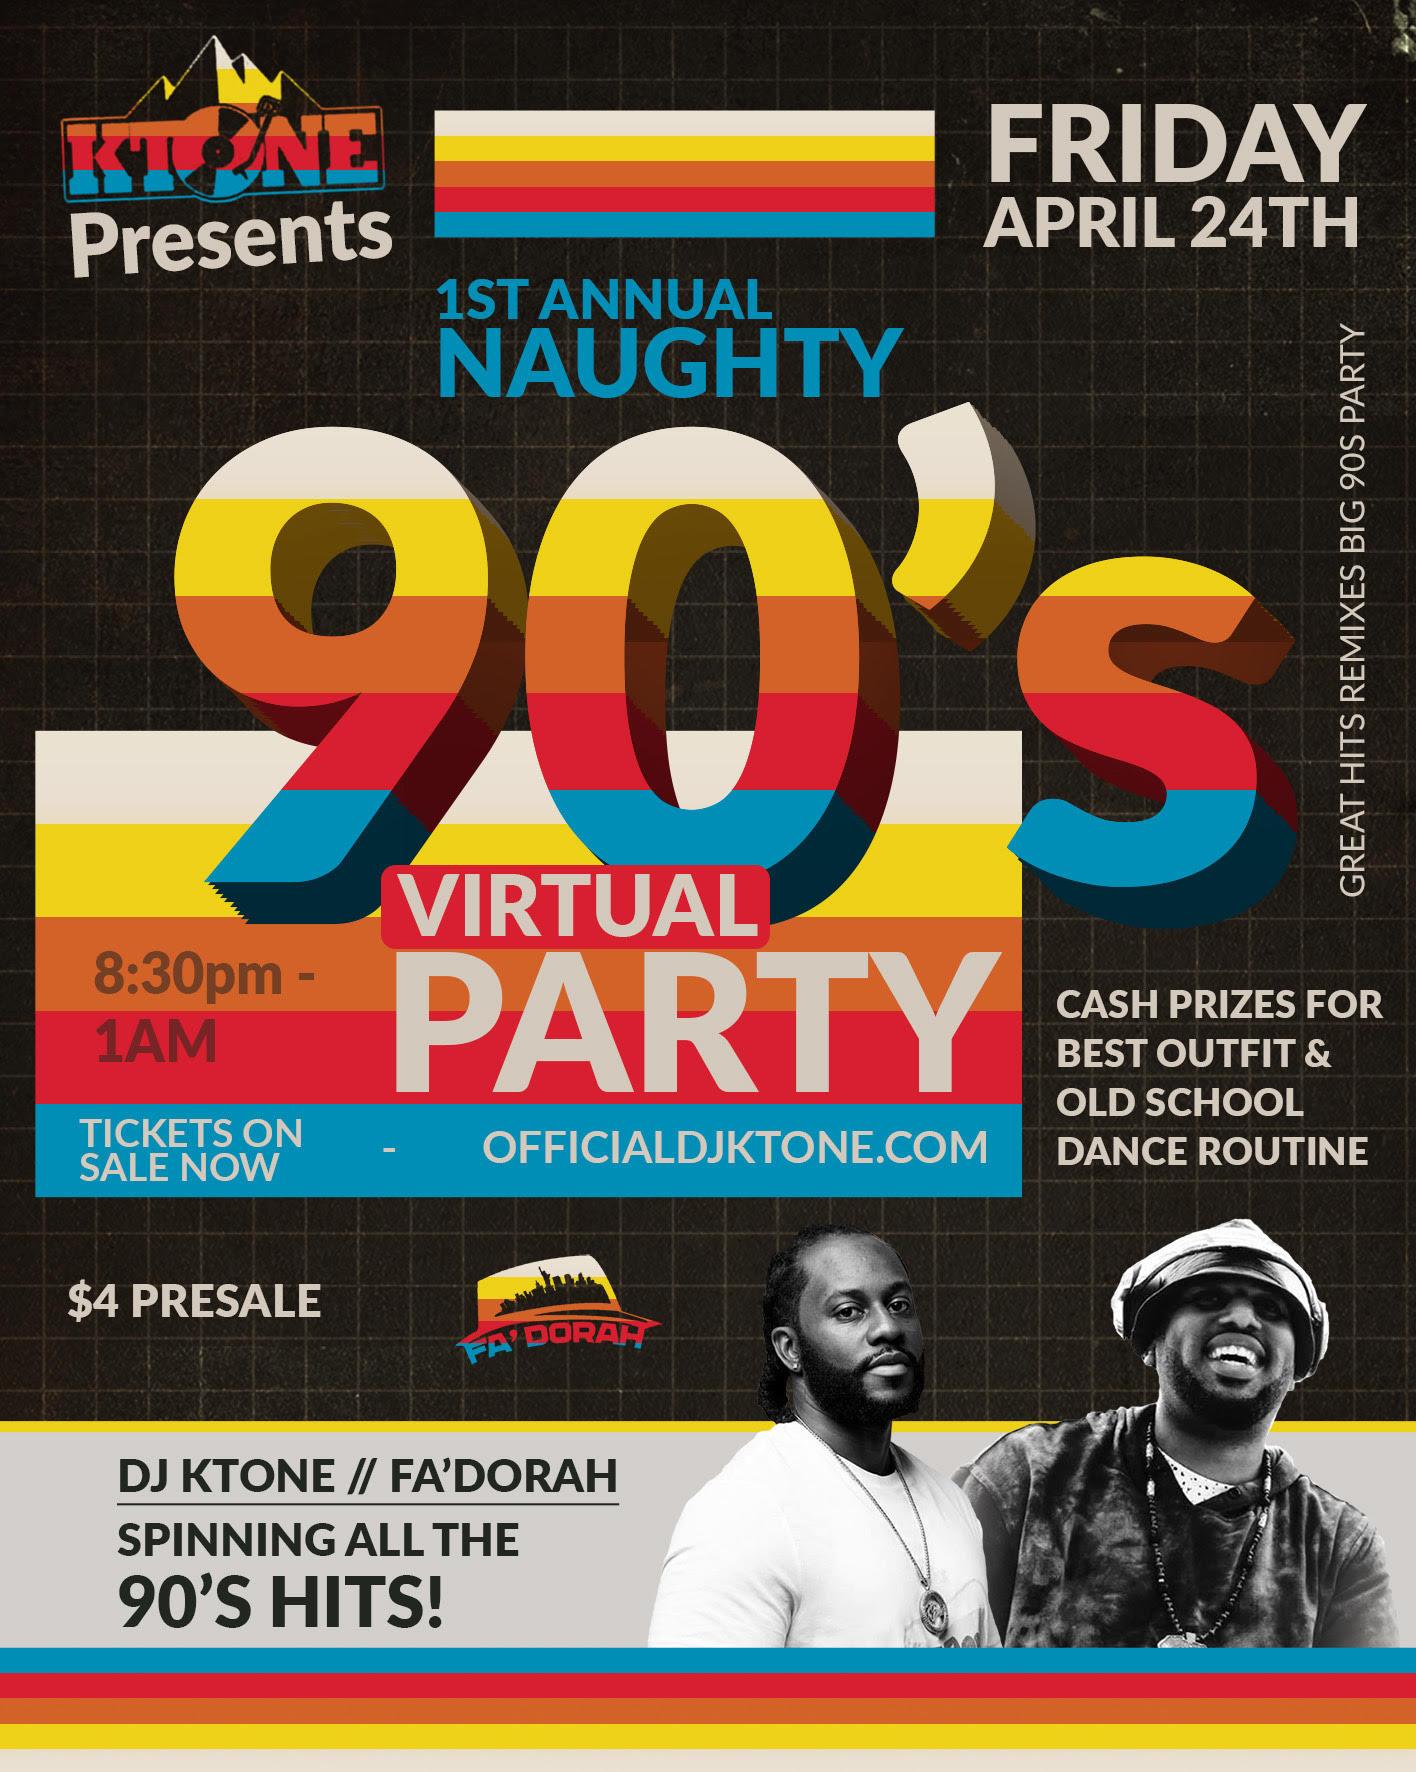 DJ Ktone Presents the 1st Annual Naughty 90's Virtual Party with DJ Fa' Dorah